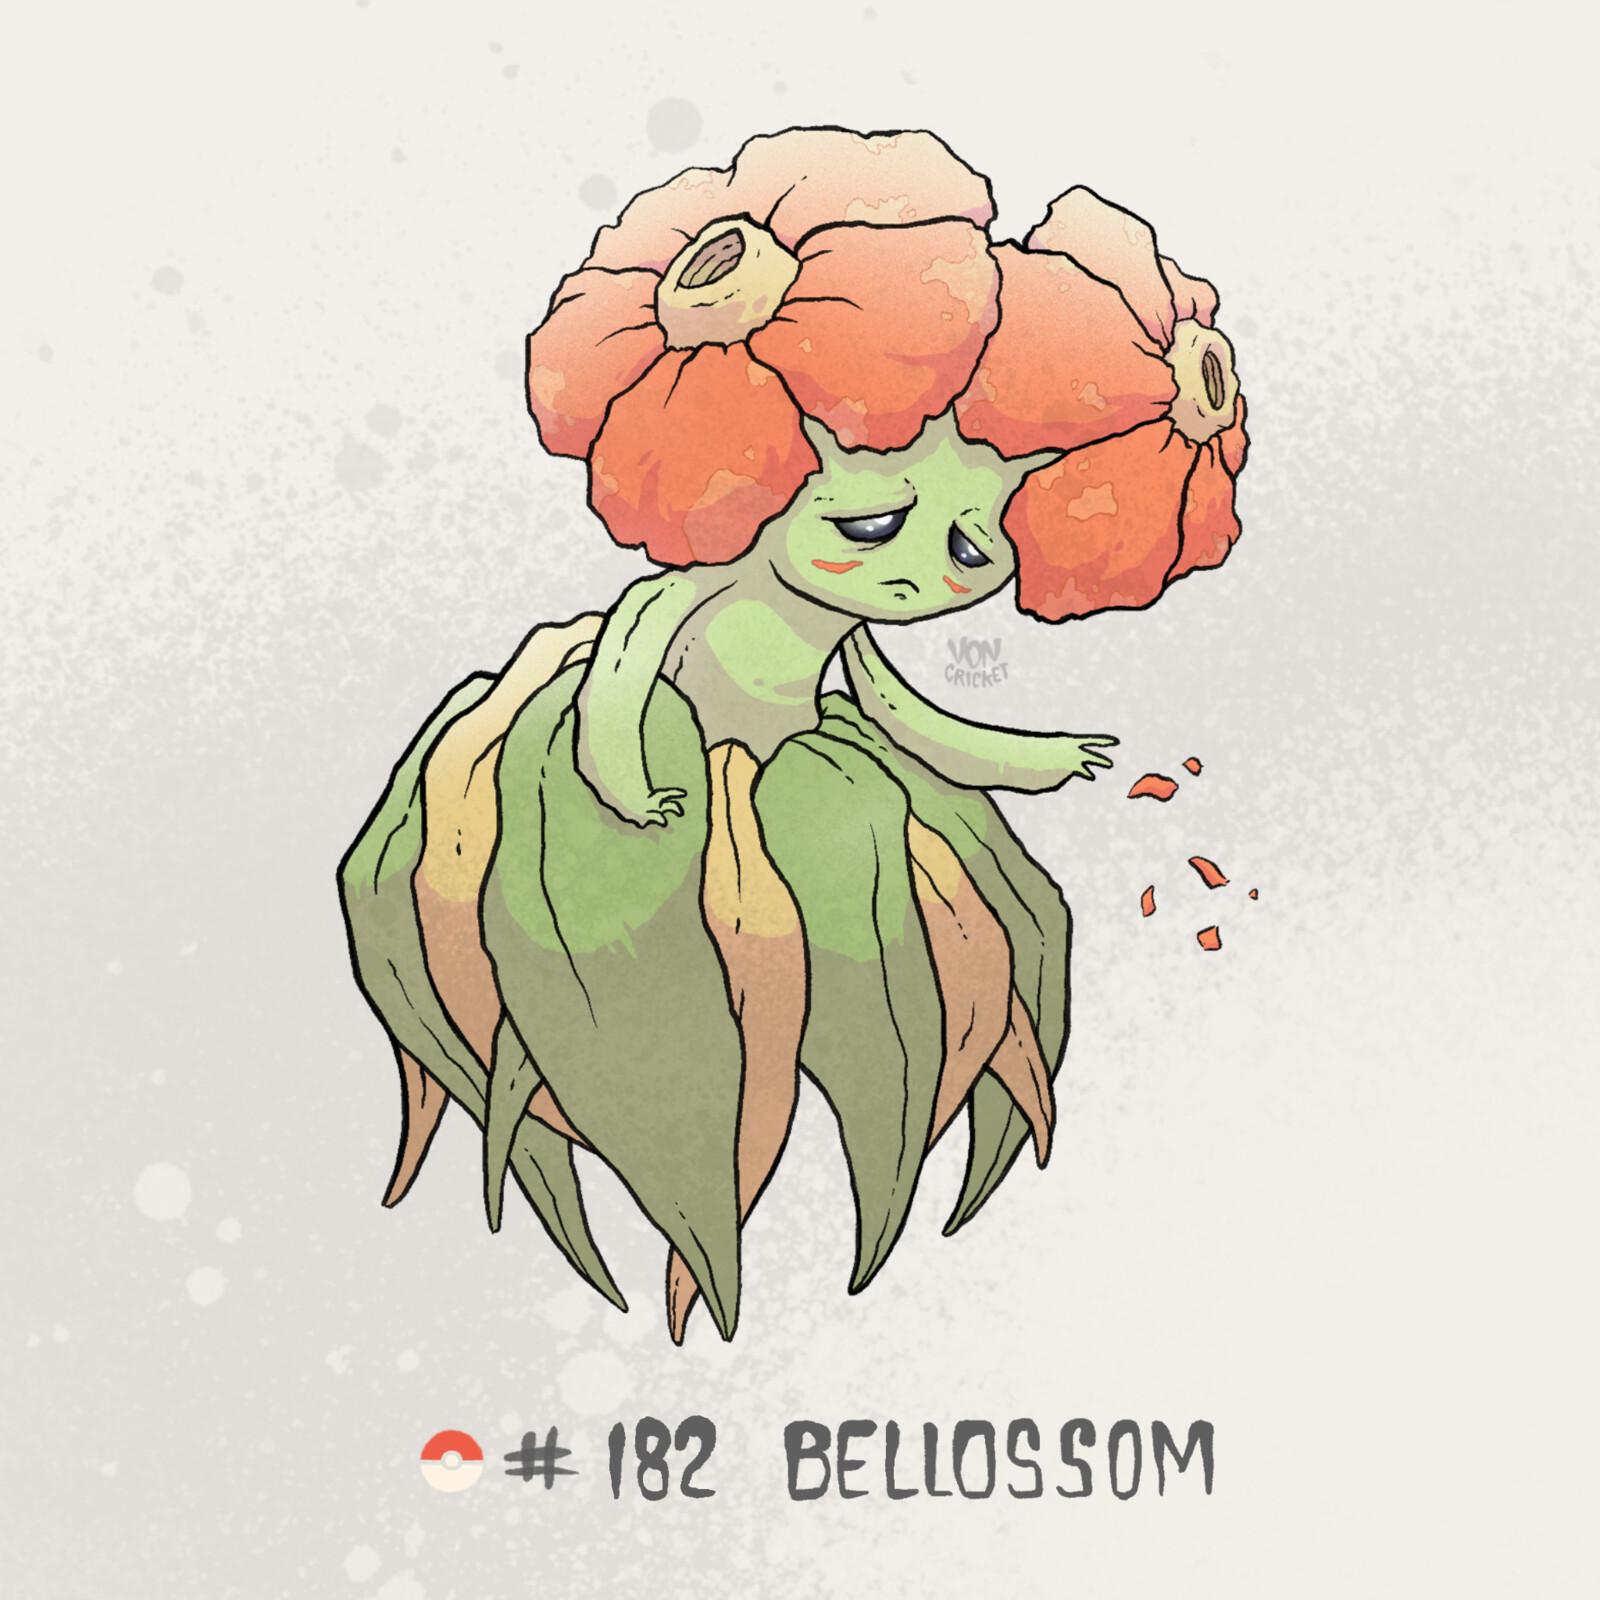 #182 Bellossom